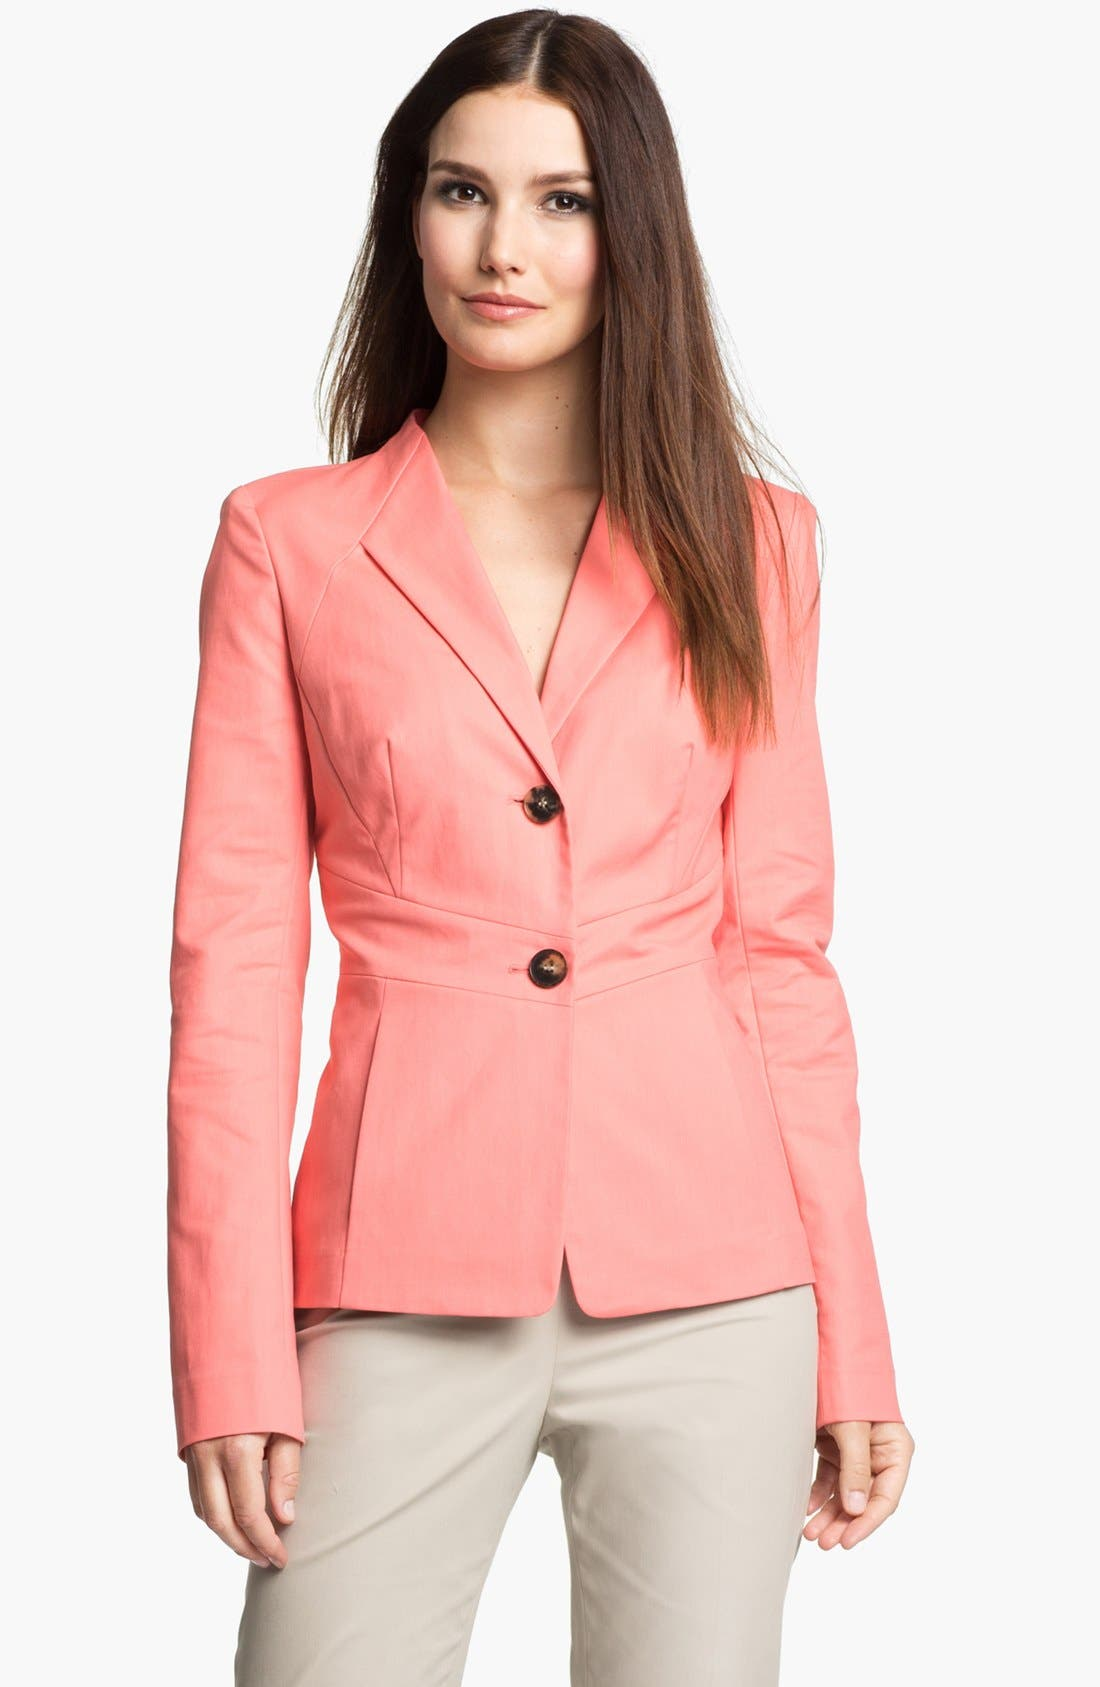 Main Image - Lafayette 148 New York 'Bailey - Metropolitan Stretch' Jacket